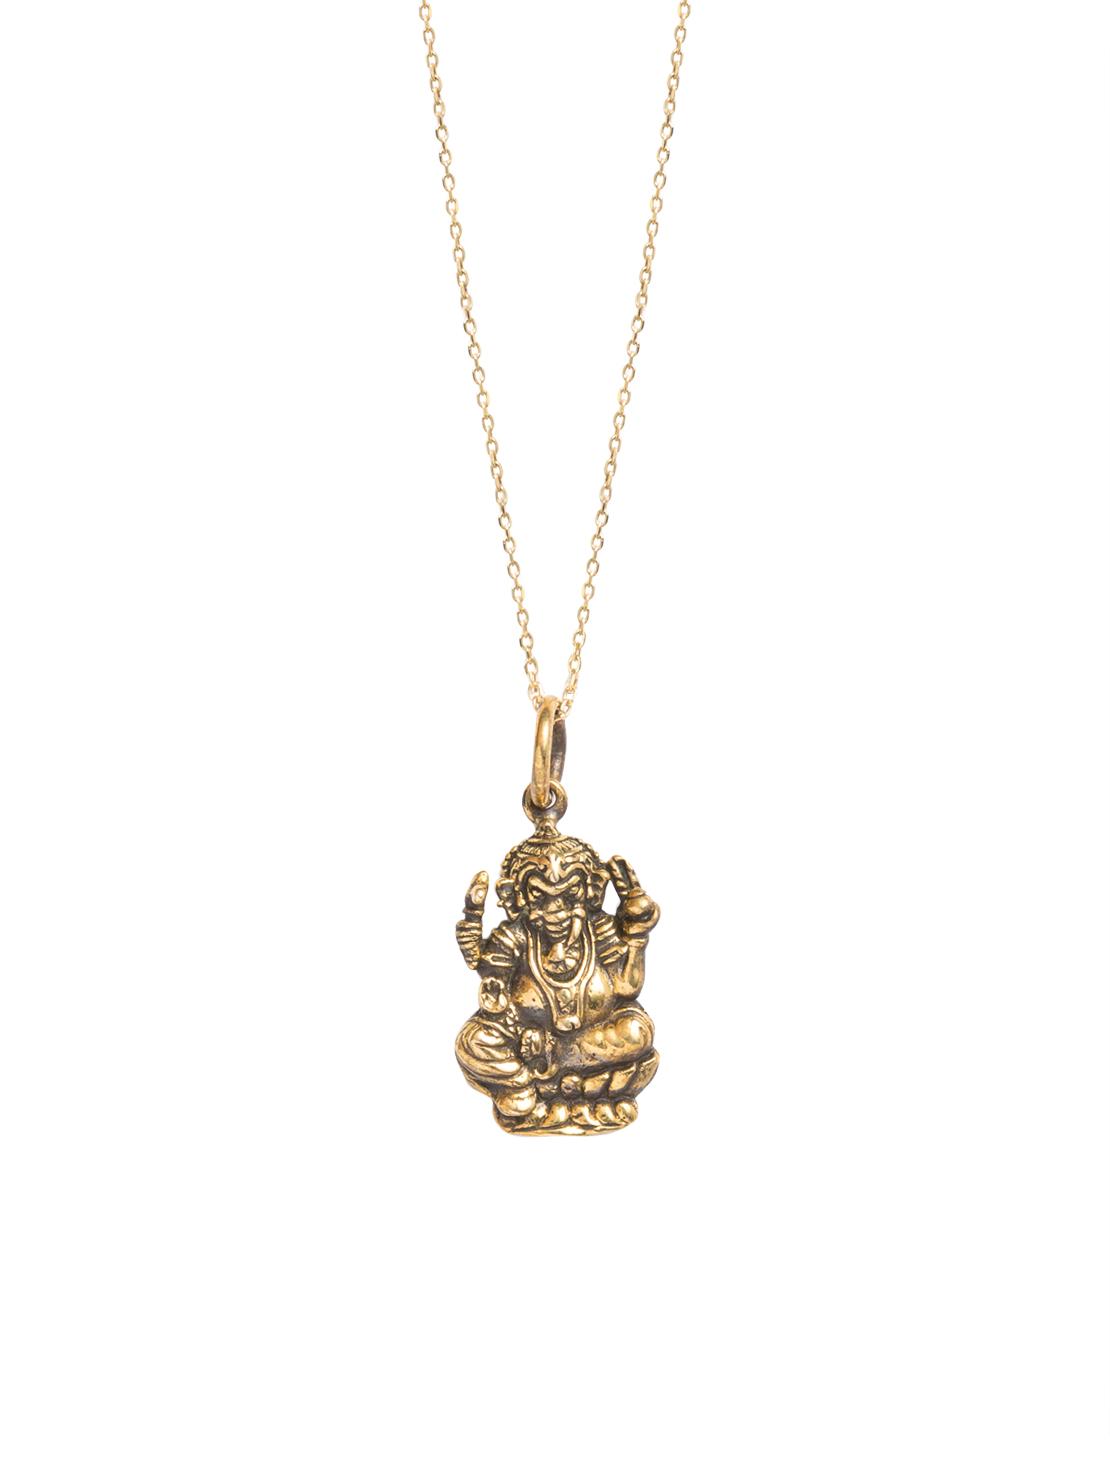 9b31c6faa05 Large Ganesh Necklace - Tilly Sveaas Jewellery